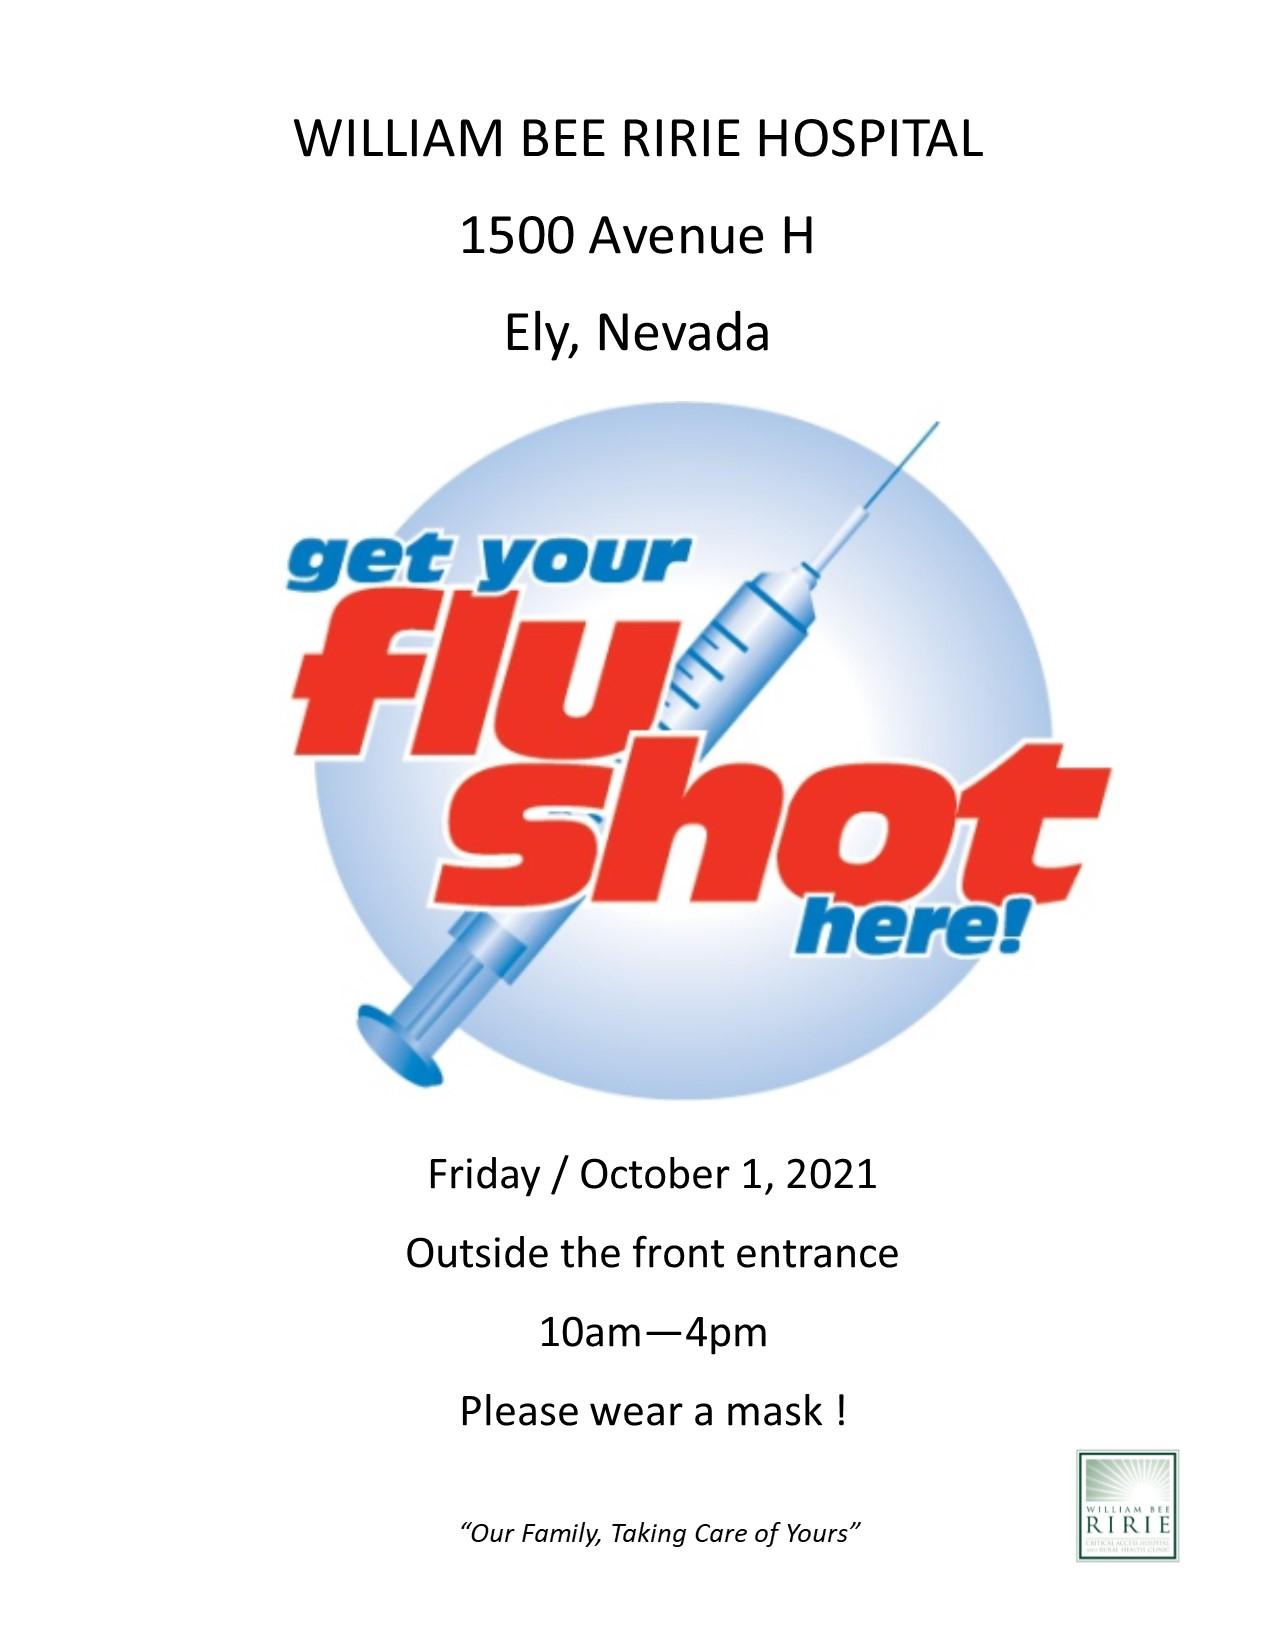 Flu Shots available Oct. 1, 2021